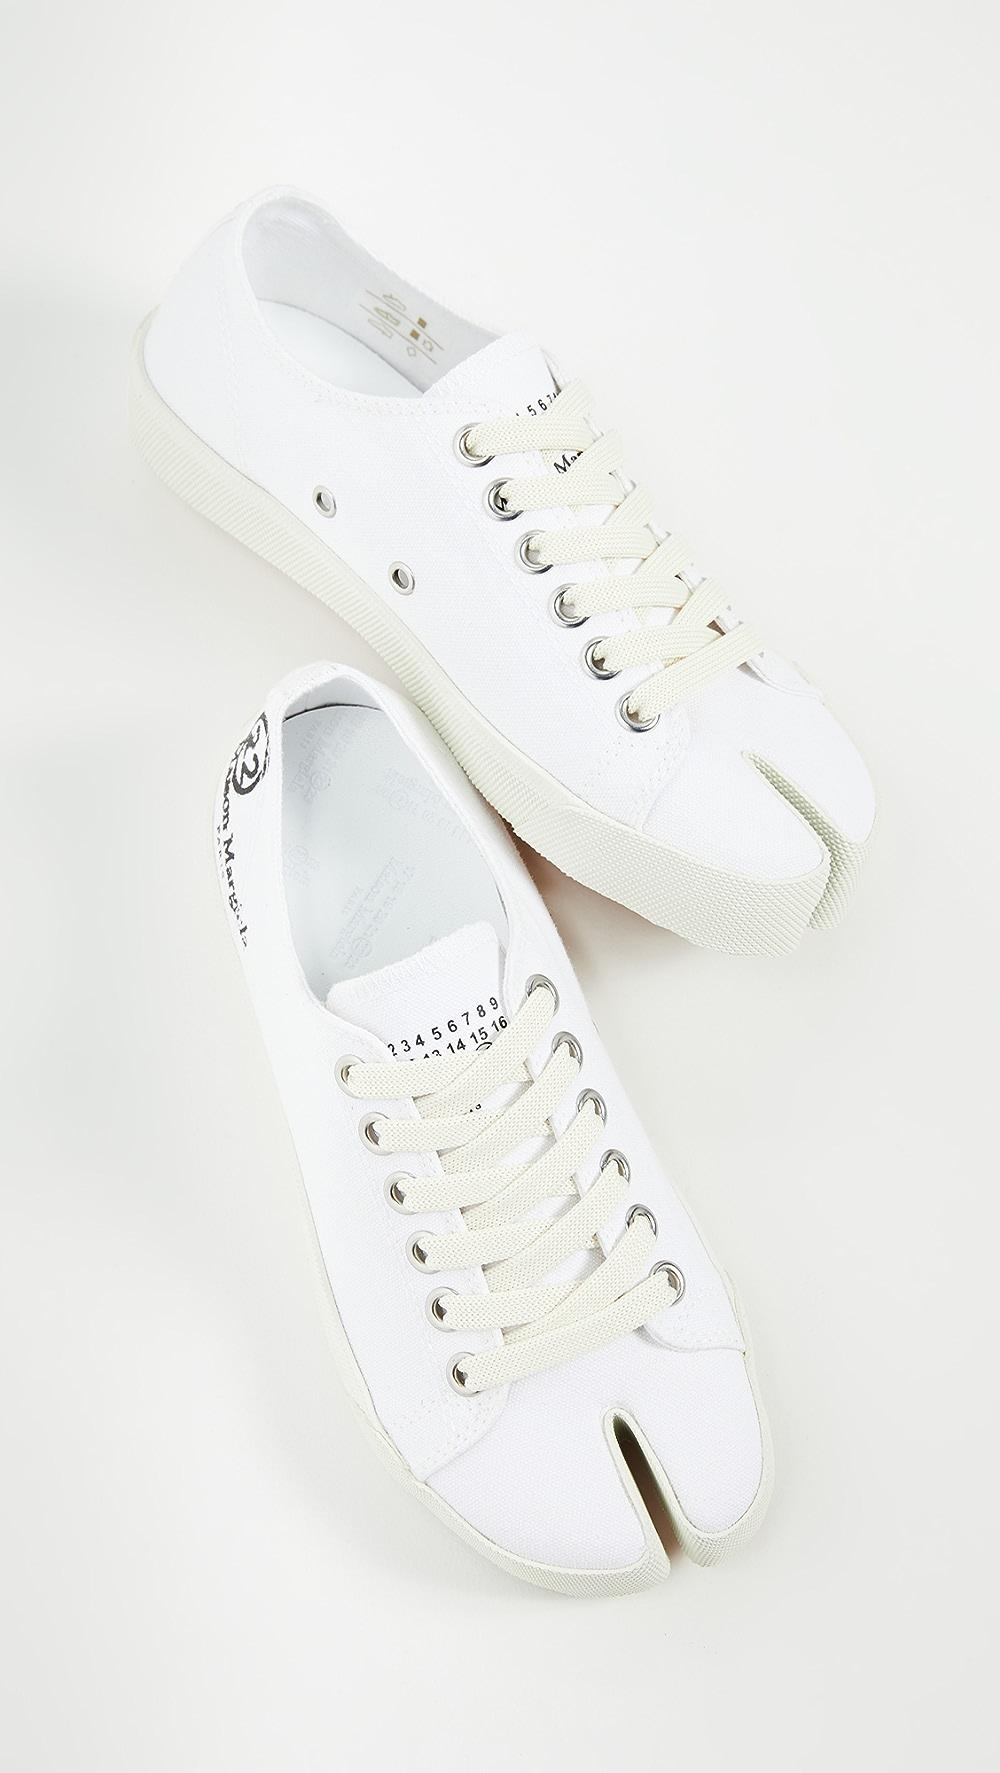 2019 Fashion Maison Margiela - Tabi Sneakers Outstanding Features